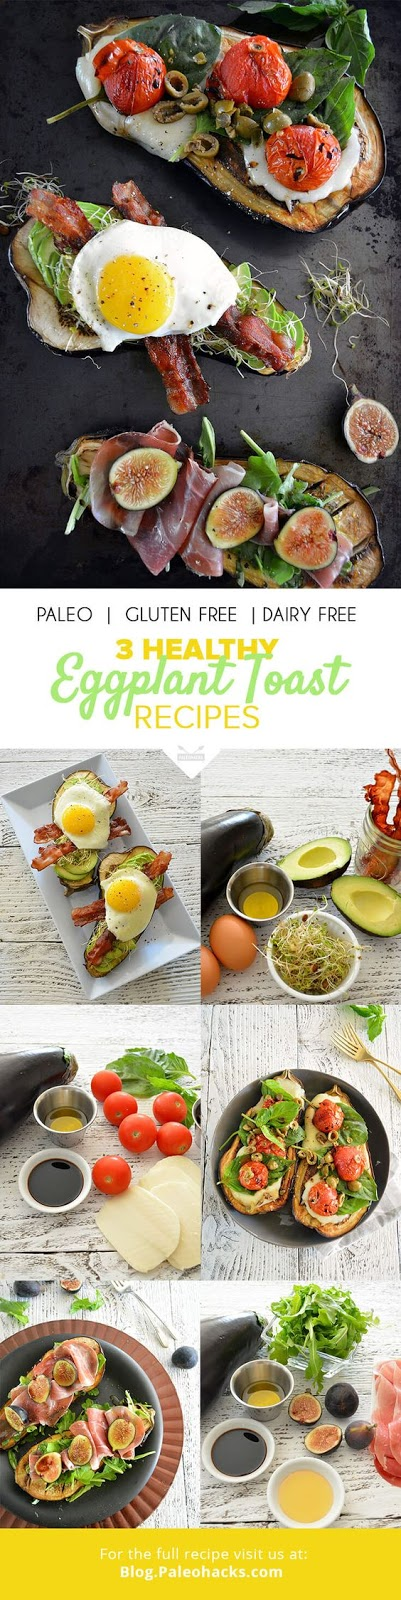 3 Healthy Eggplant Toast Recipes